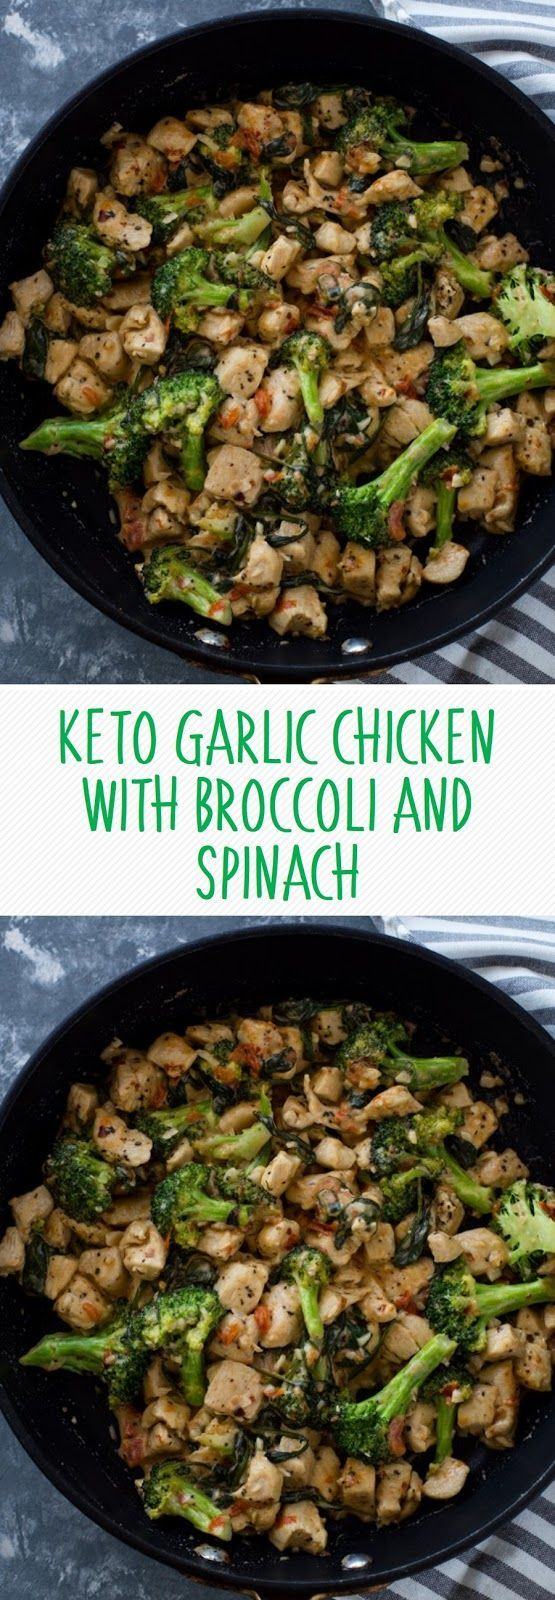 KETO GARLIC CHICKEN WITH BROCCOLI AND SPINACH #chickenfoodrecipes #ketogenic